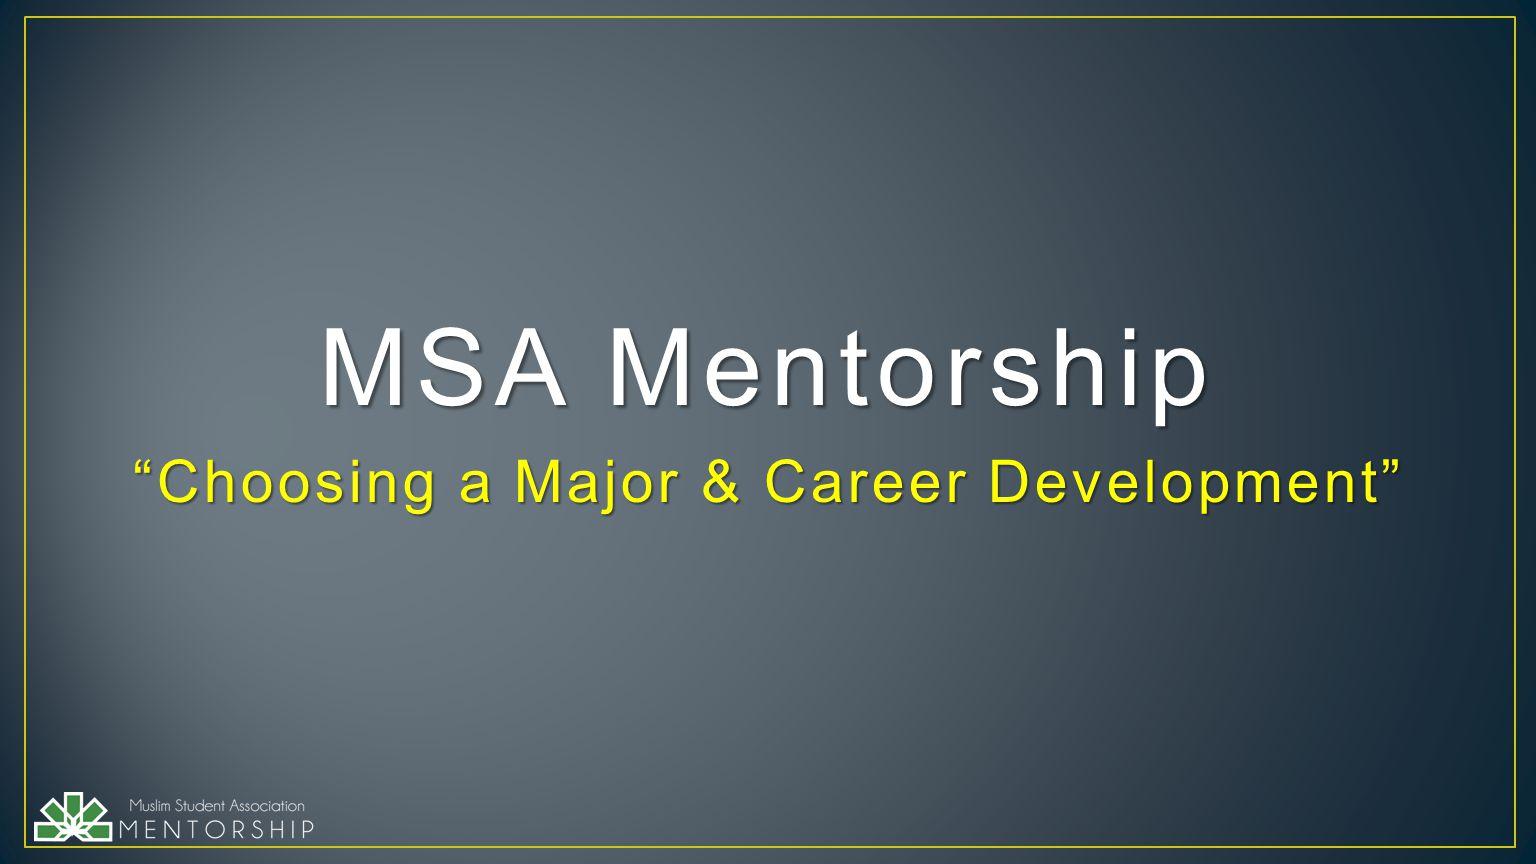 Choosing a Major & Career Development MSA Mentorship